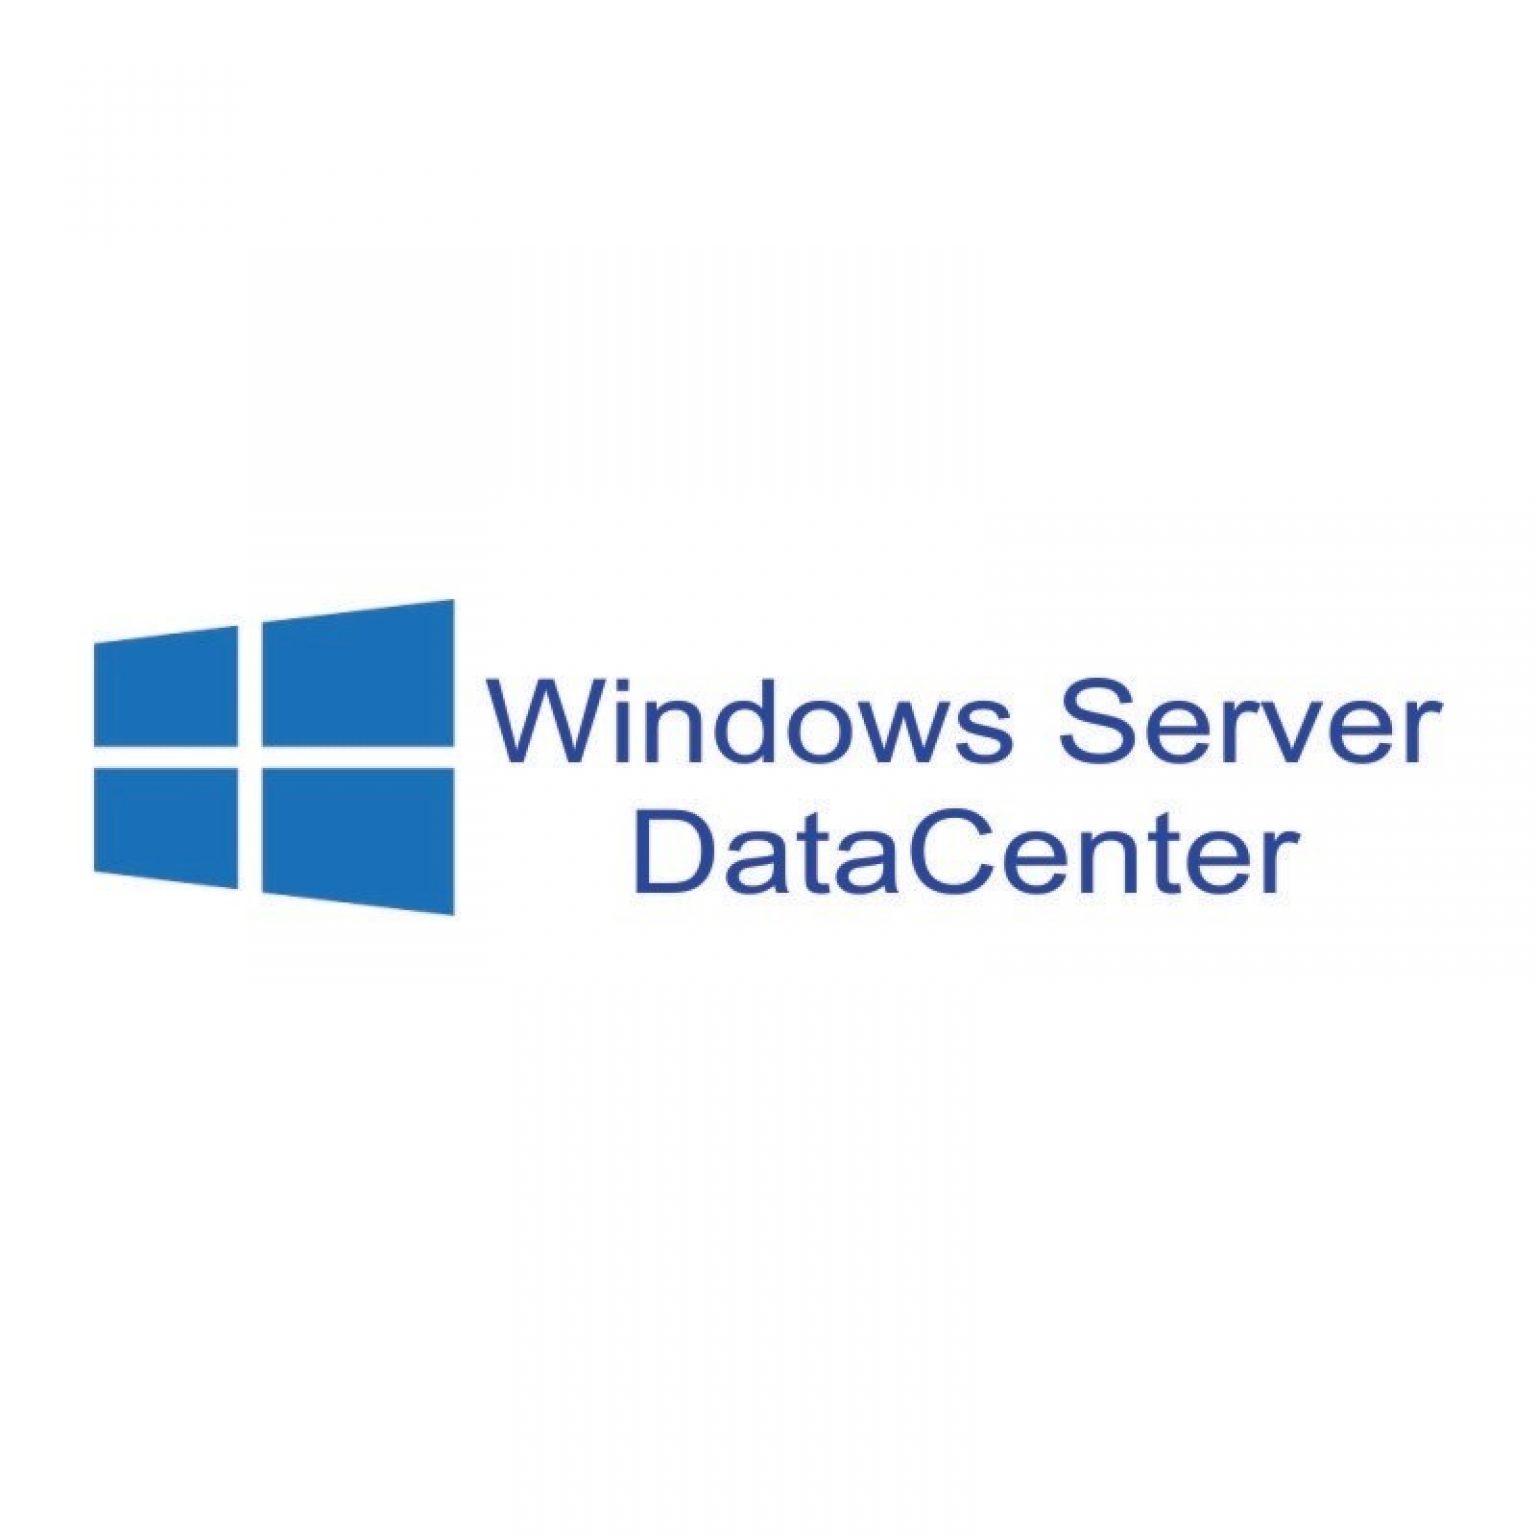 MICROSOFT - [Windows Svr ExtrnConn]WinSvrExtConn 2019 OLP NL Gov Qlfd[Pemerintah]